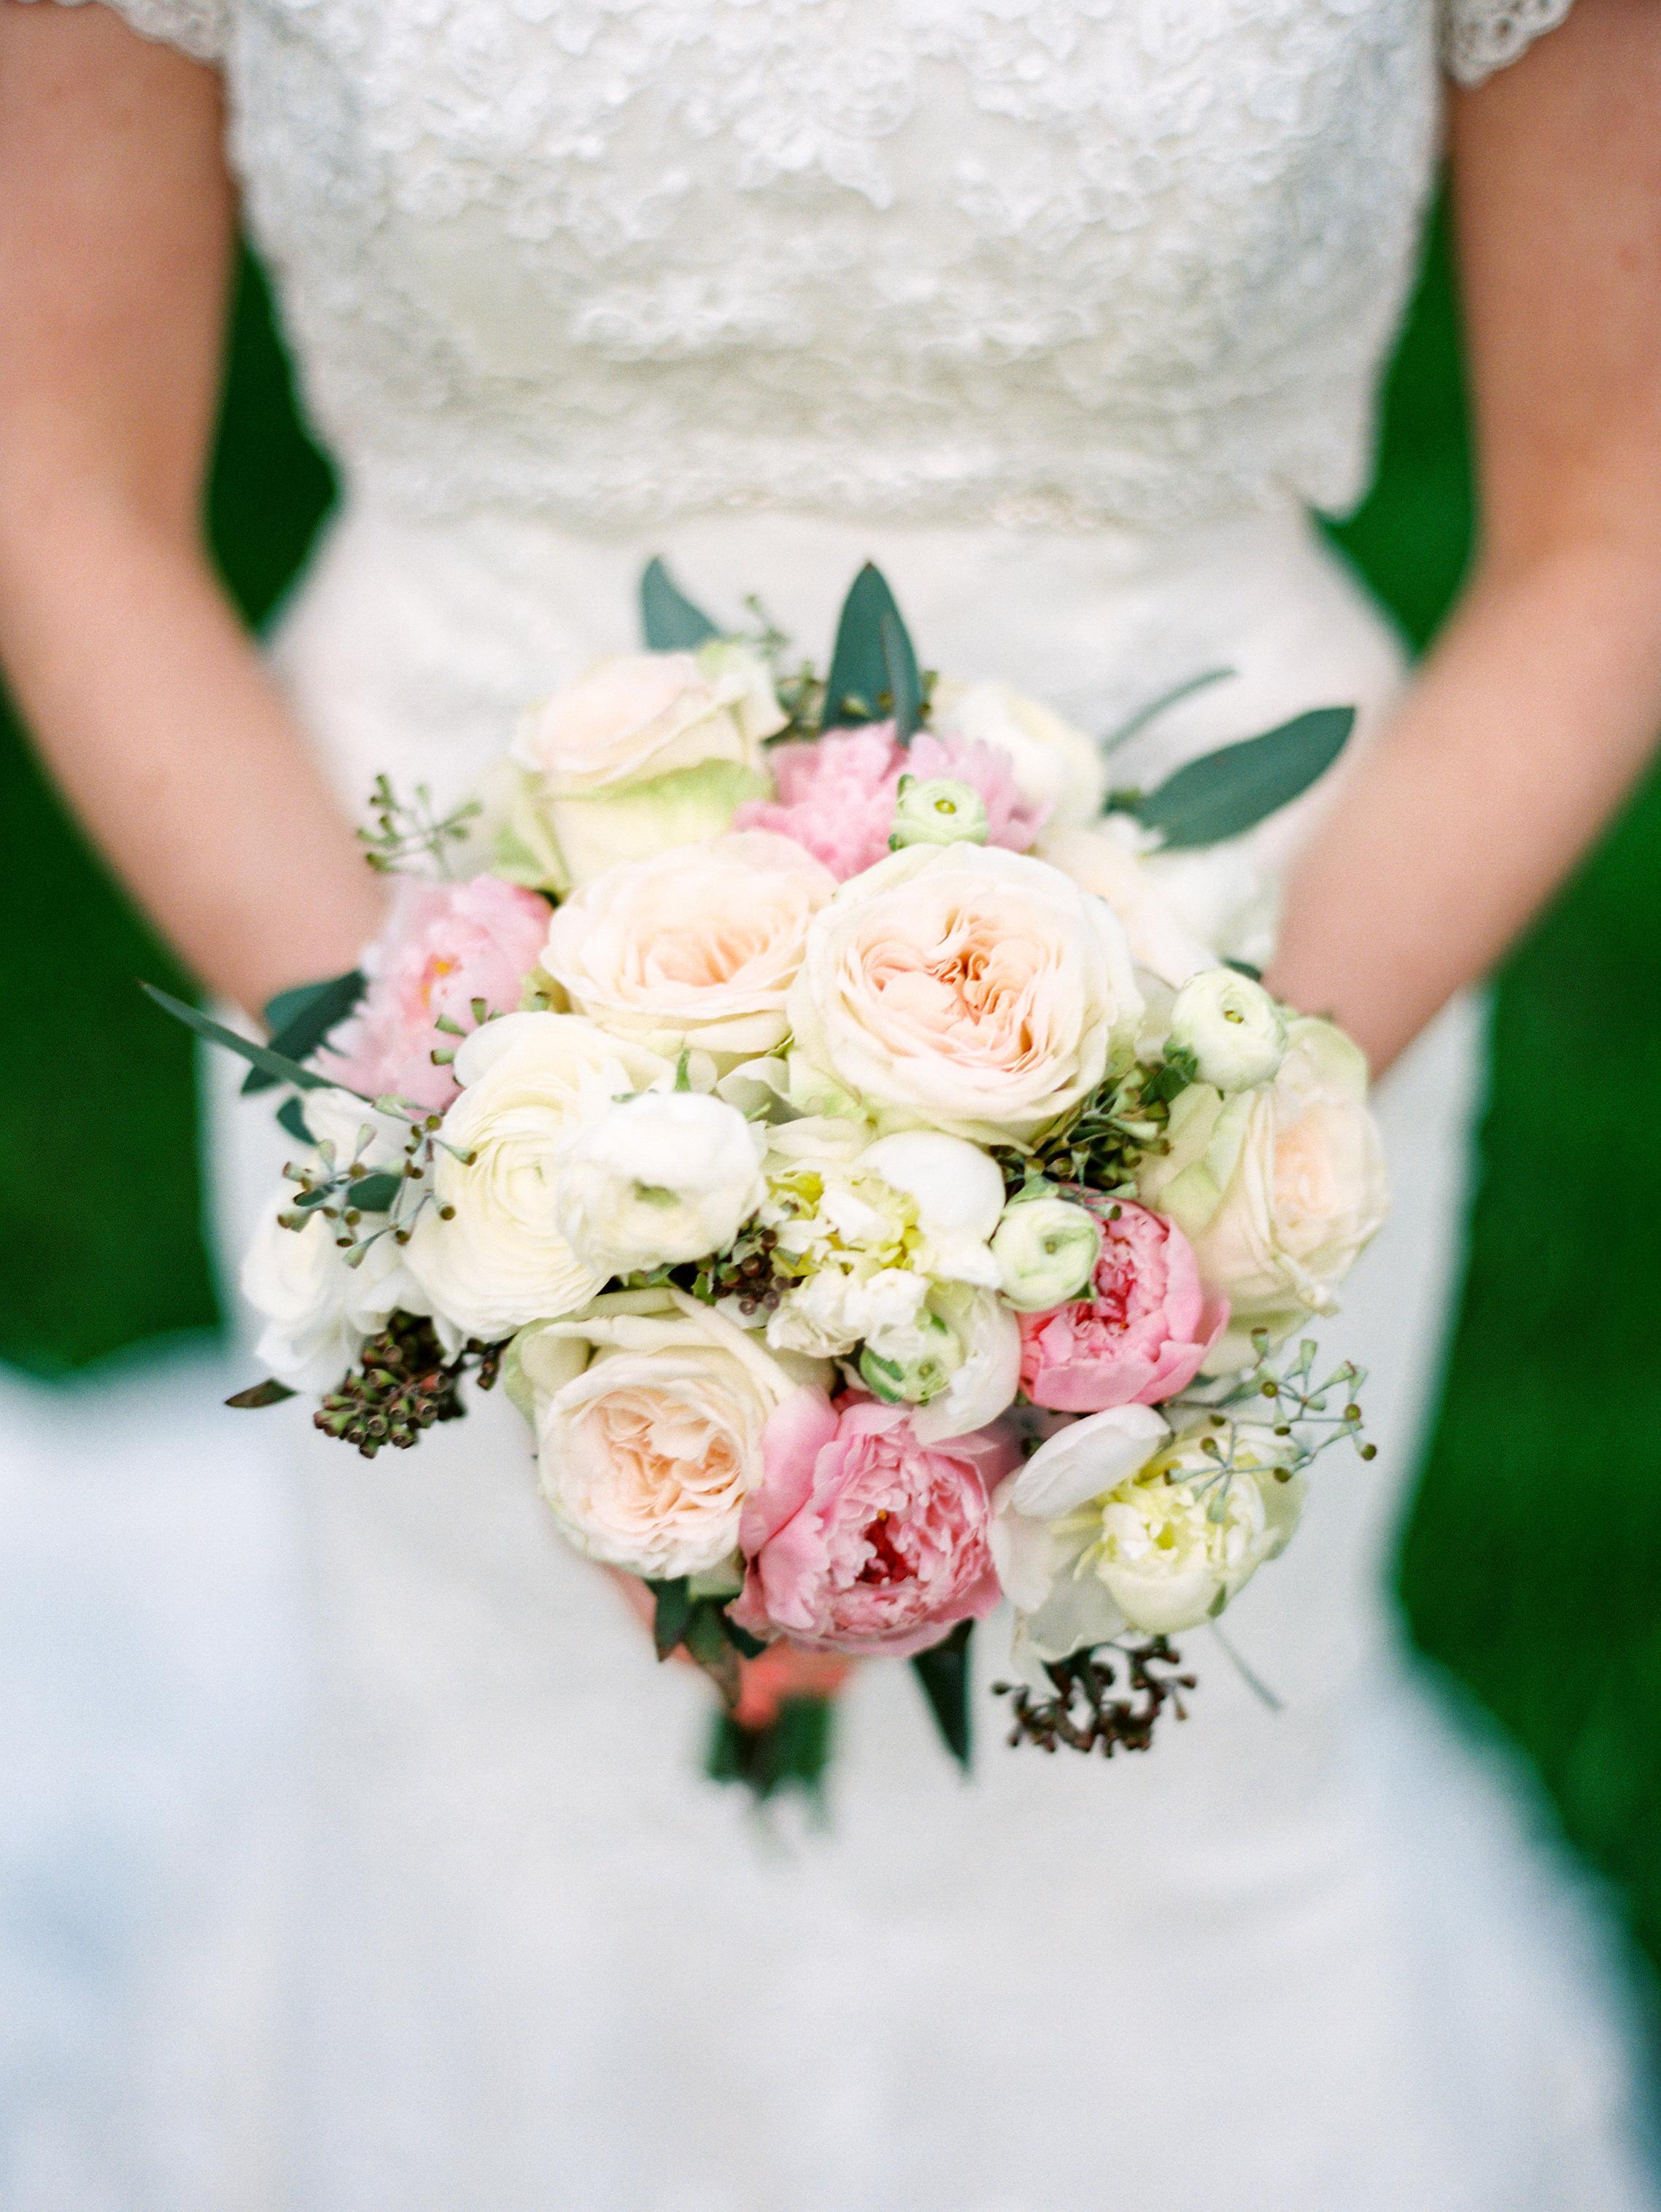 dana fernandez photography houston film wedding photographer destination heather's glen texas-13.jpg